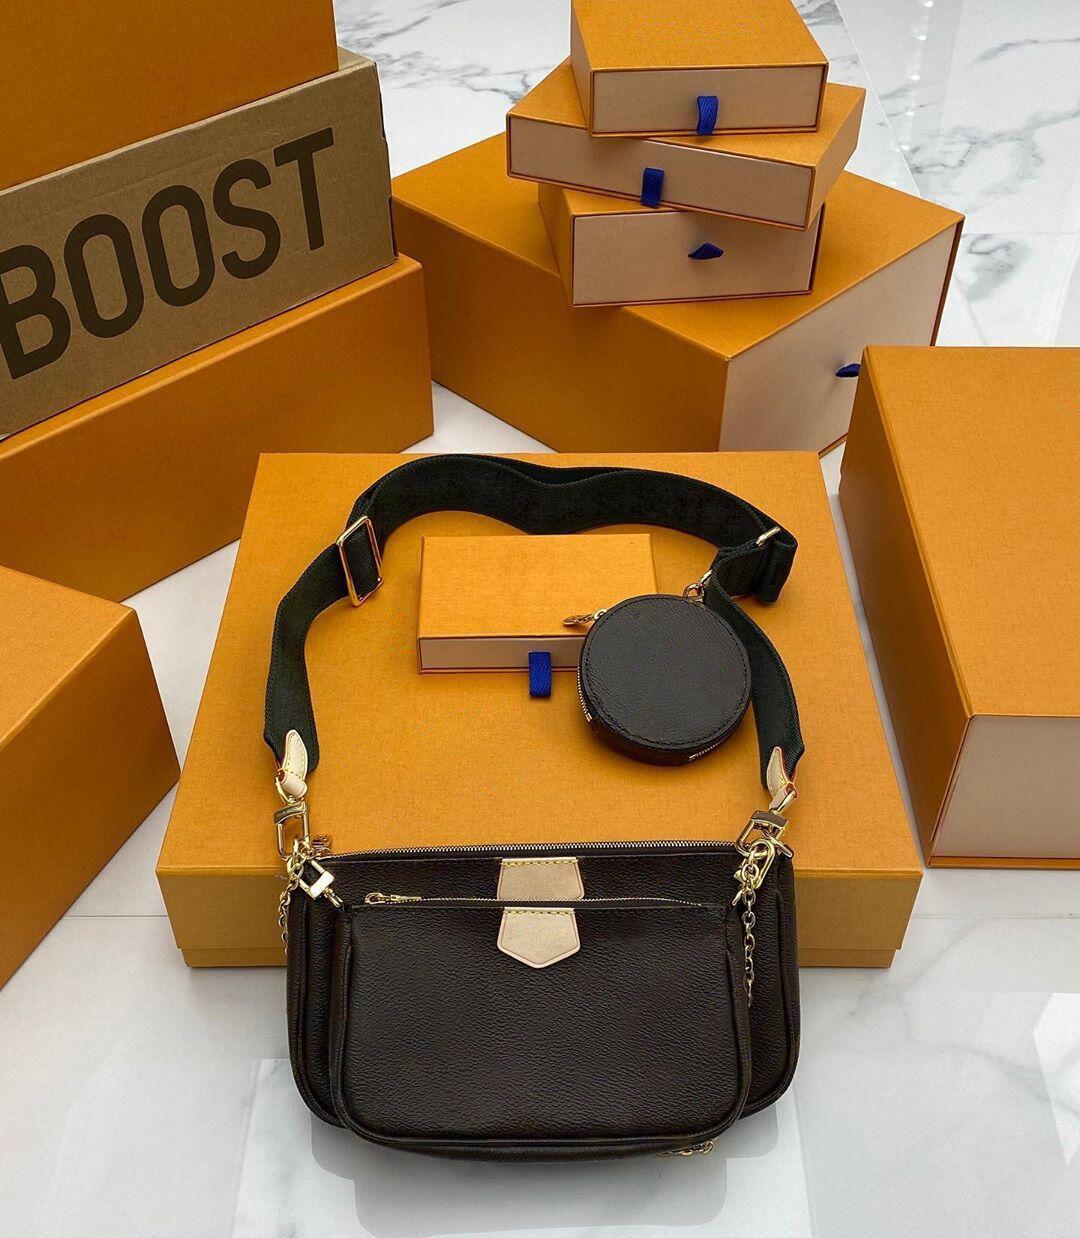 Brand bags MULTI POCHETTE ACCESSOIRES 2020 new Fashion Women's Small Shoulder Bag brand Chain Crossbody bag designer luxury handbags purses